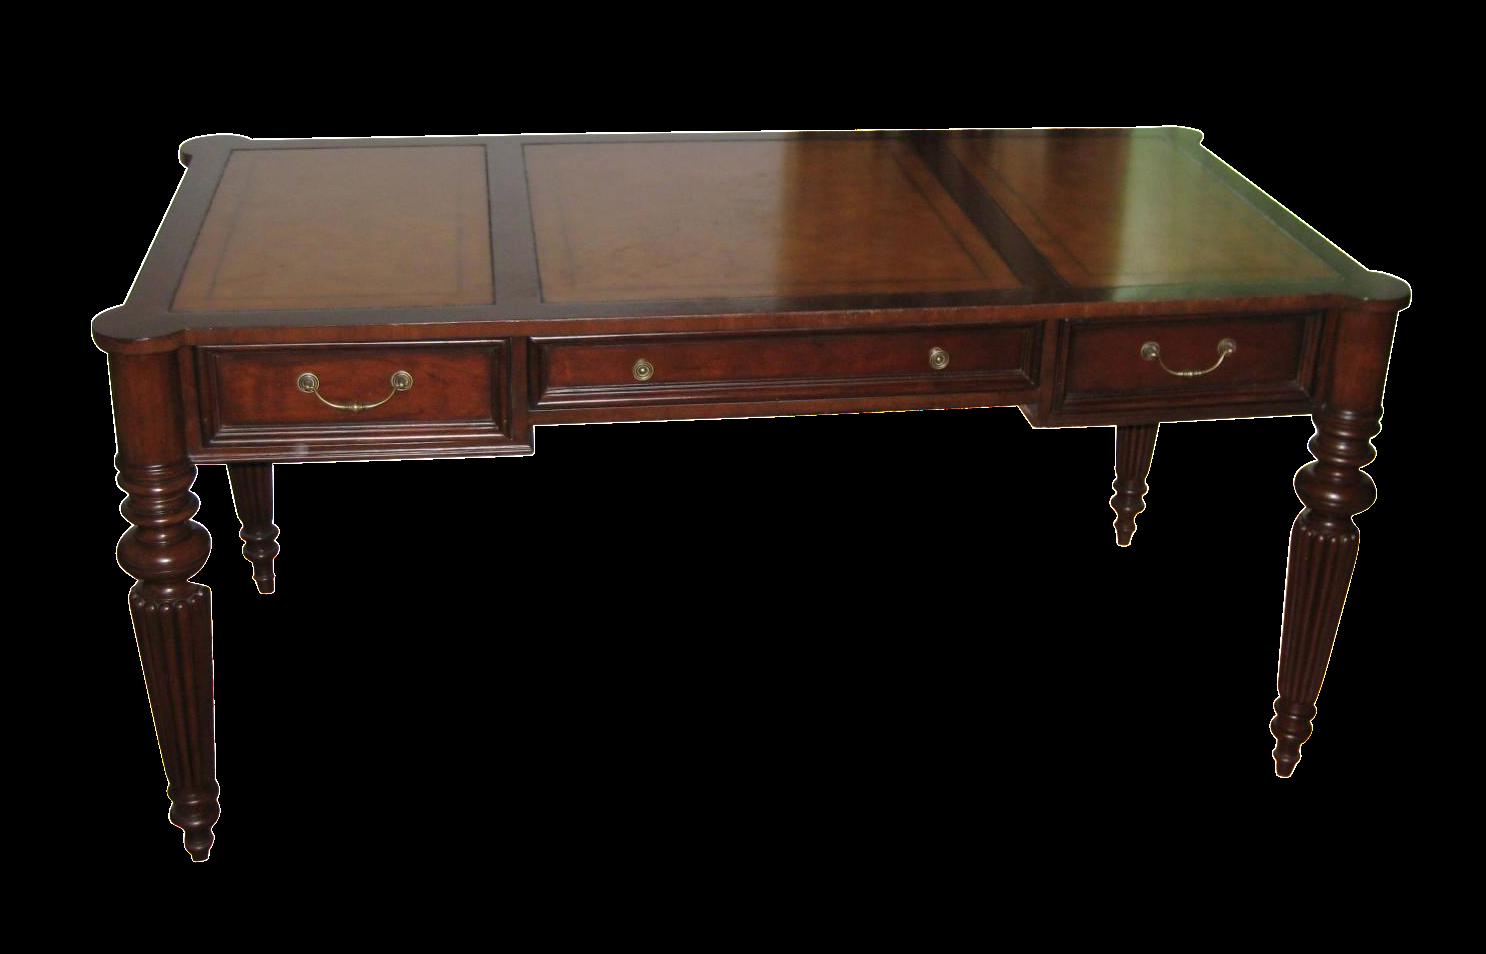 Ethan Allen Newport Edwardian Desk  Chairish. Ergonomic Adjustable Desk. Craft Desks With Storage. Power Desk. Large Square Coffee Table. Steel Picnic Table. Wood End Tables. Black End Tables With Drawers. Light Oak End Tables